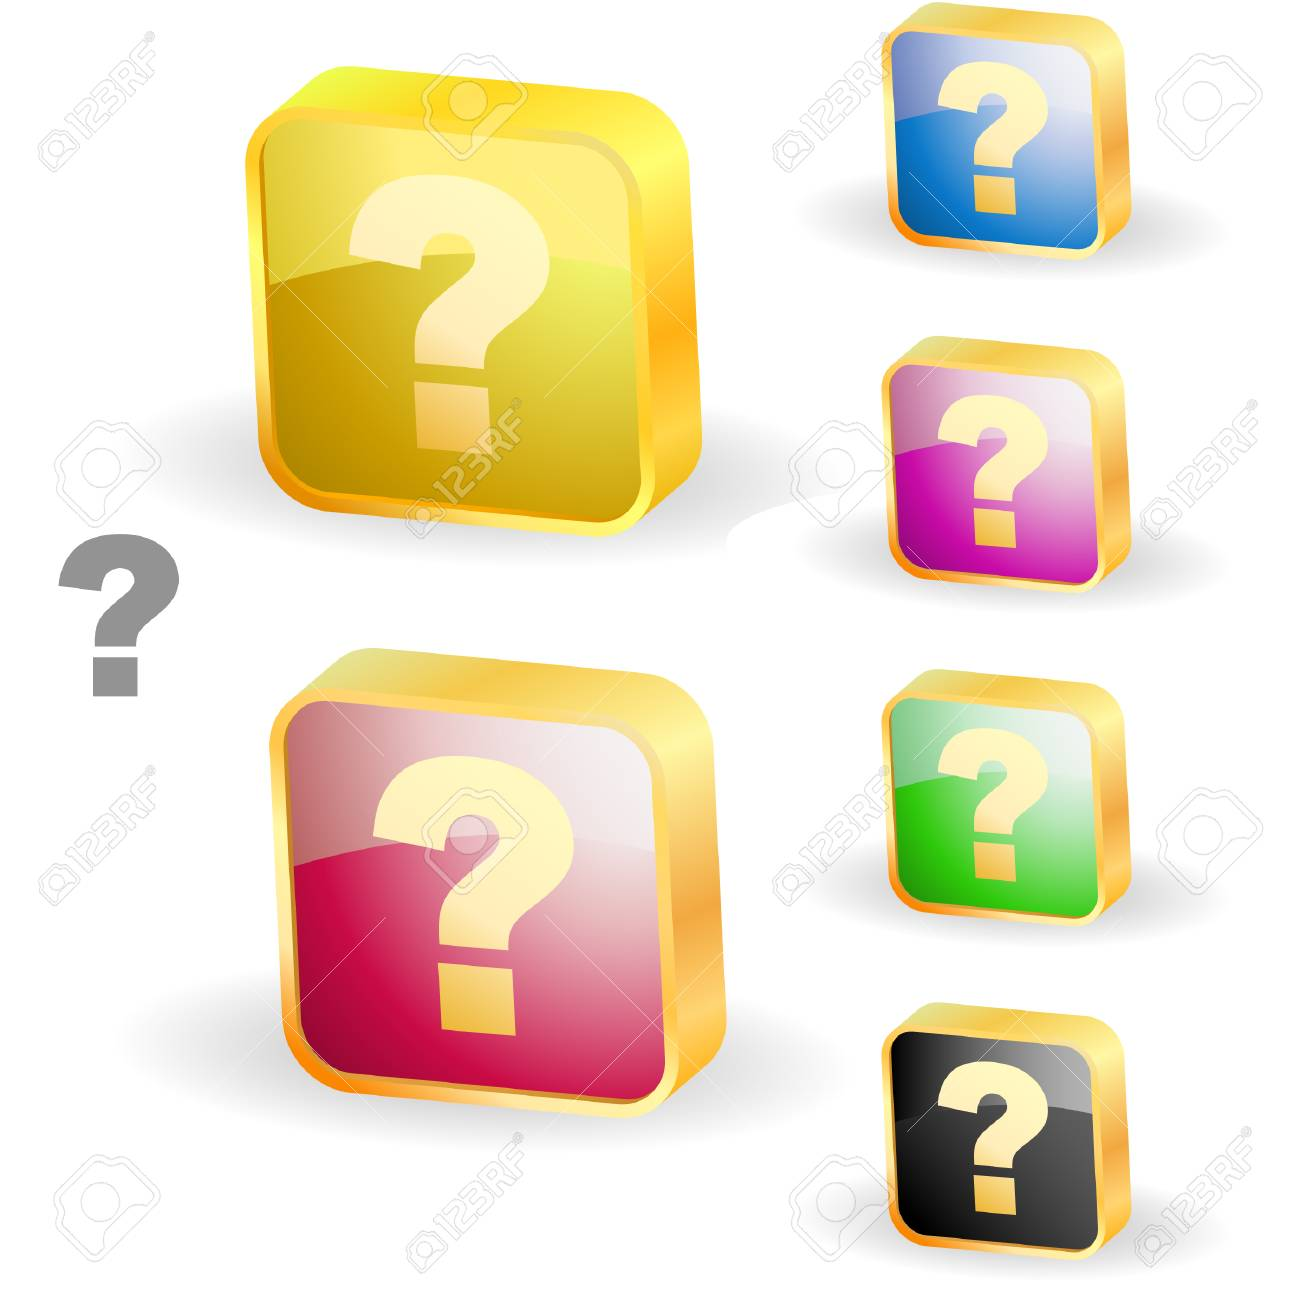 Question vector elements. Stock Vector - 6331564